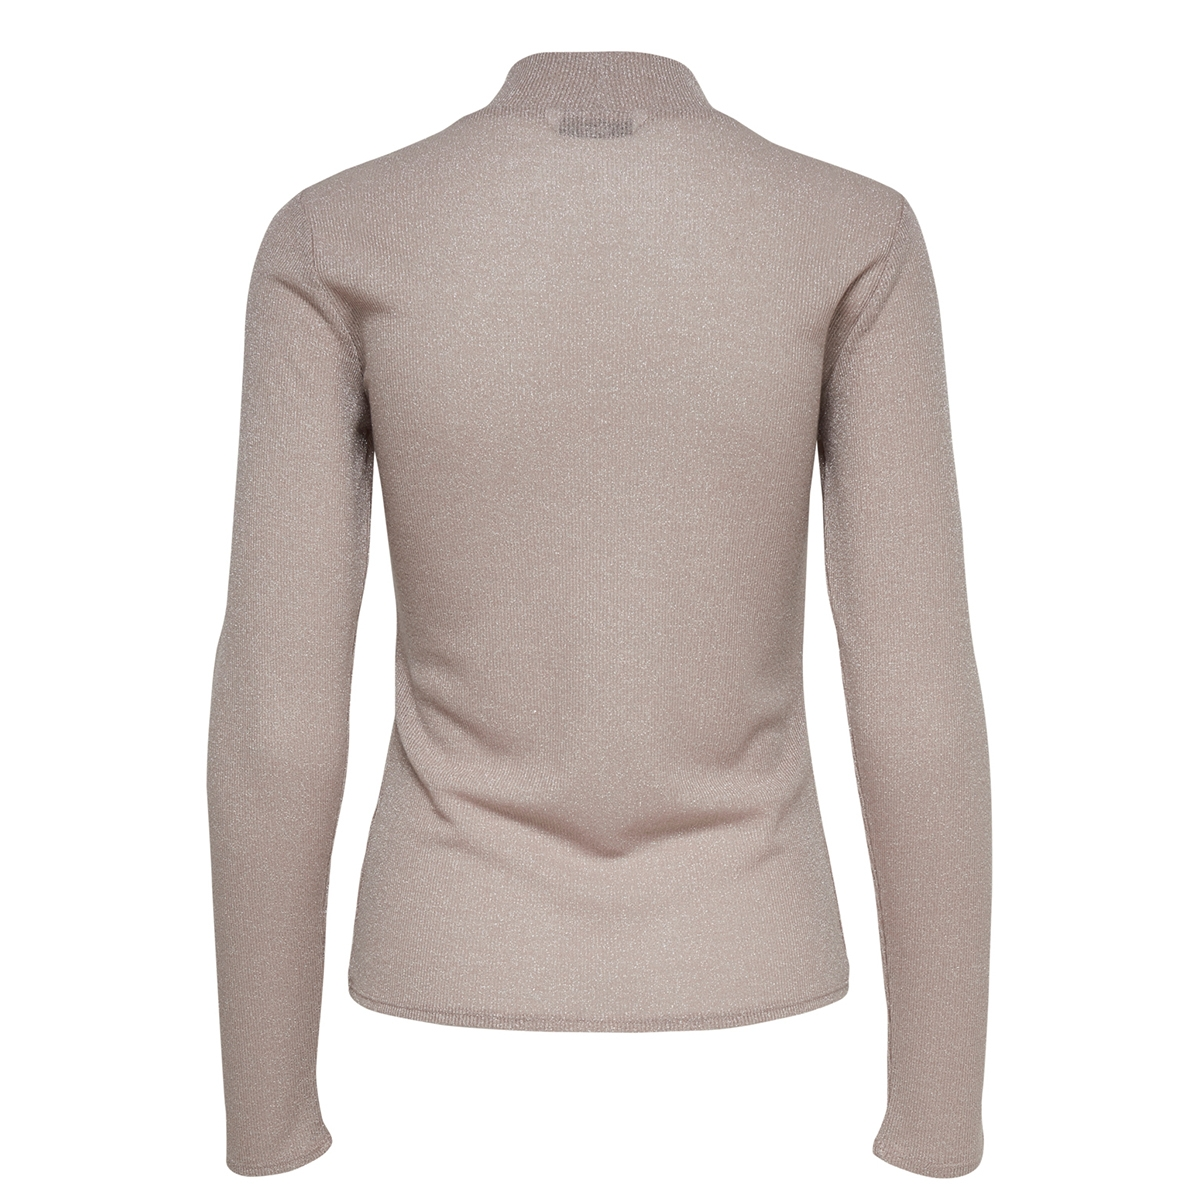 onldiana  lurex l/s top jrs noos 15180844 only t-shirt rose smoke